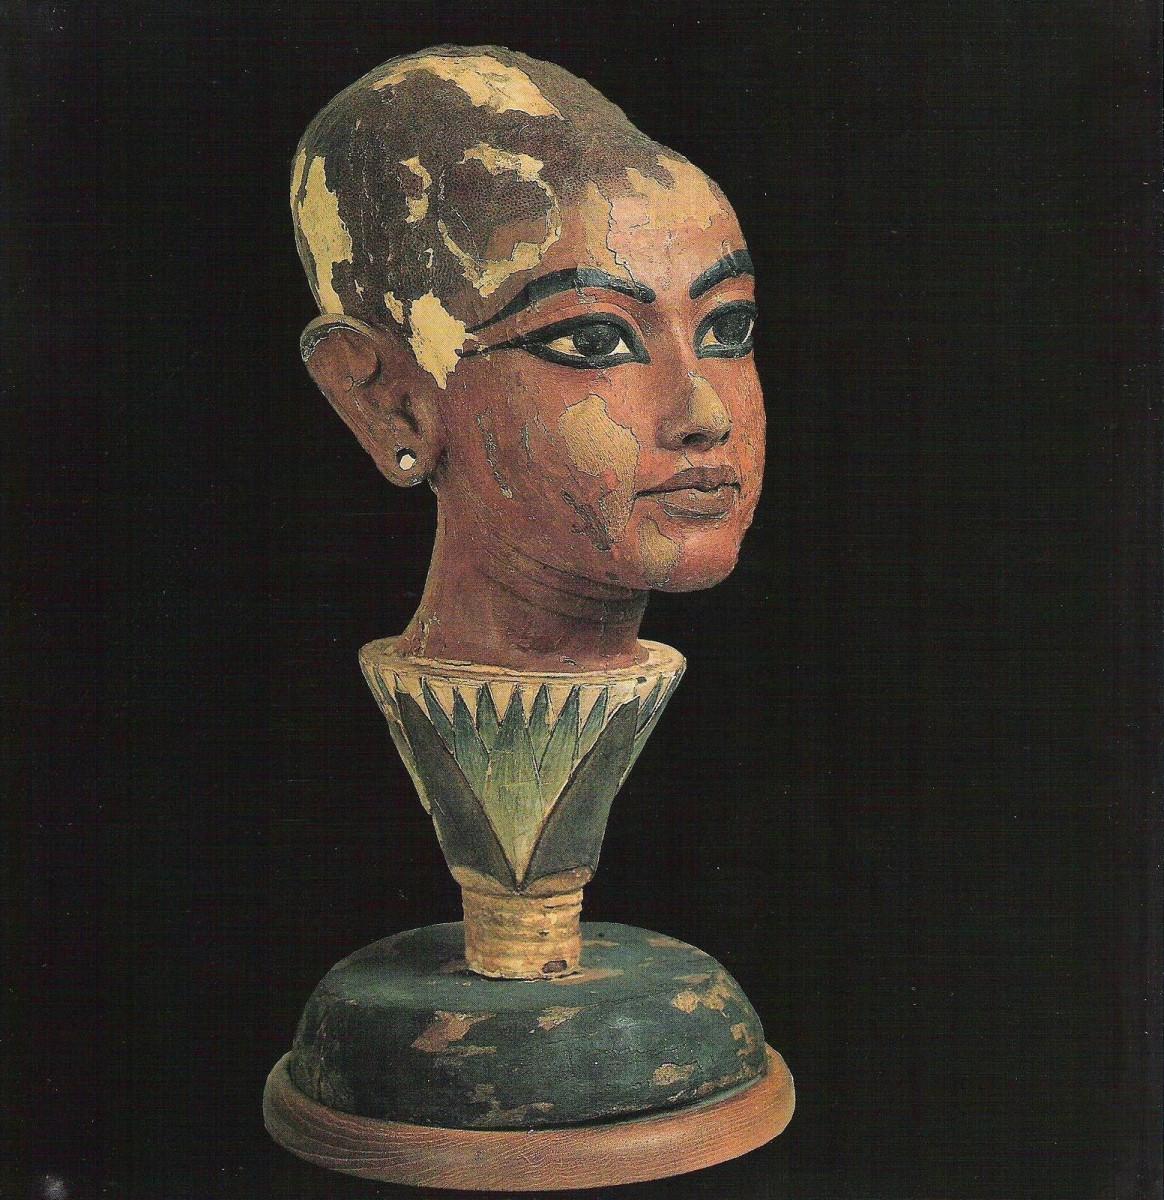 Tutankhamun as a young Sun God emerging from a lotus flower. Cairo Museum.